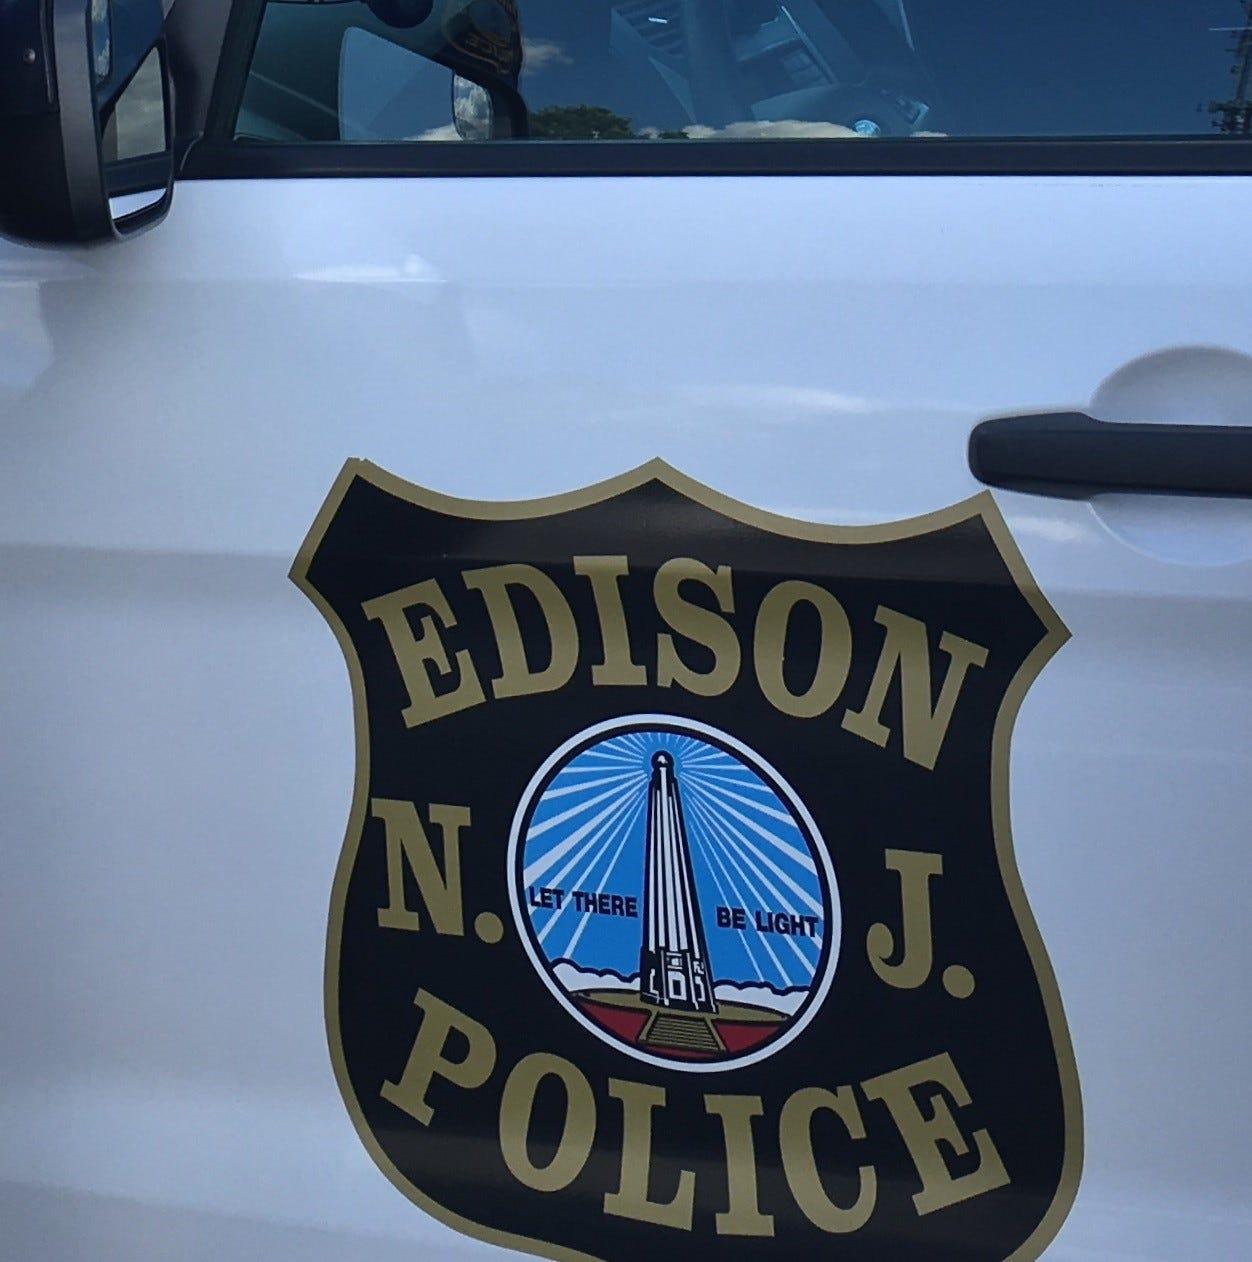 Edison man charged in crash that seriously injured woman, 86